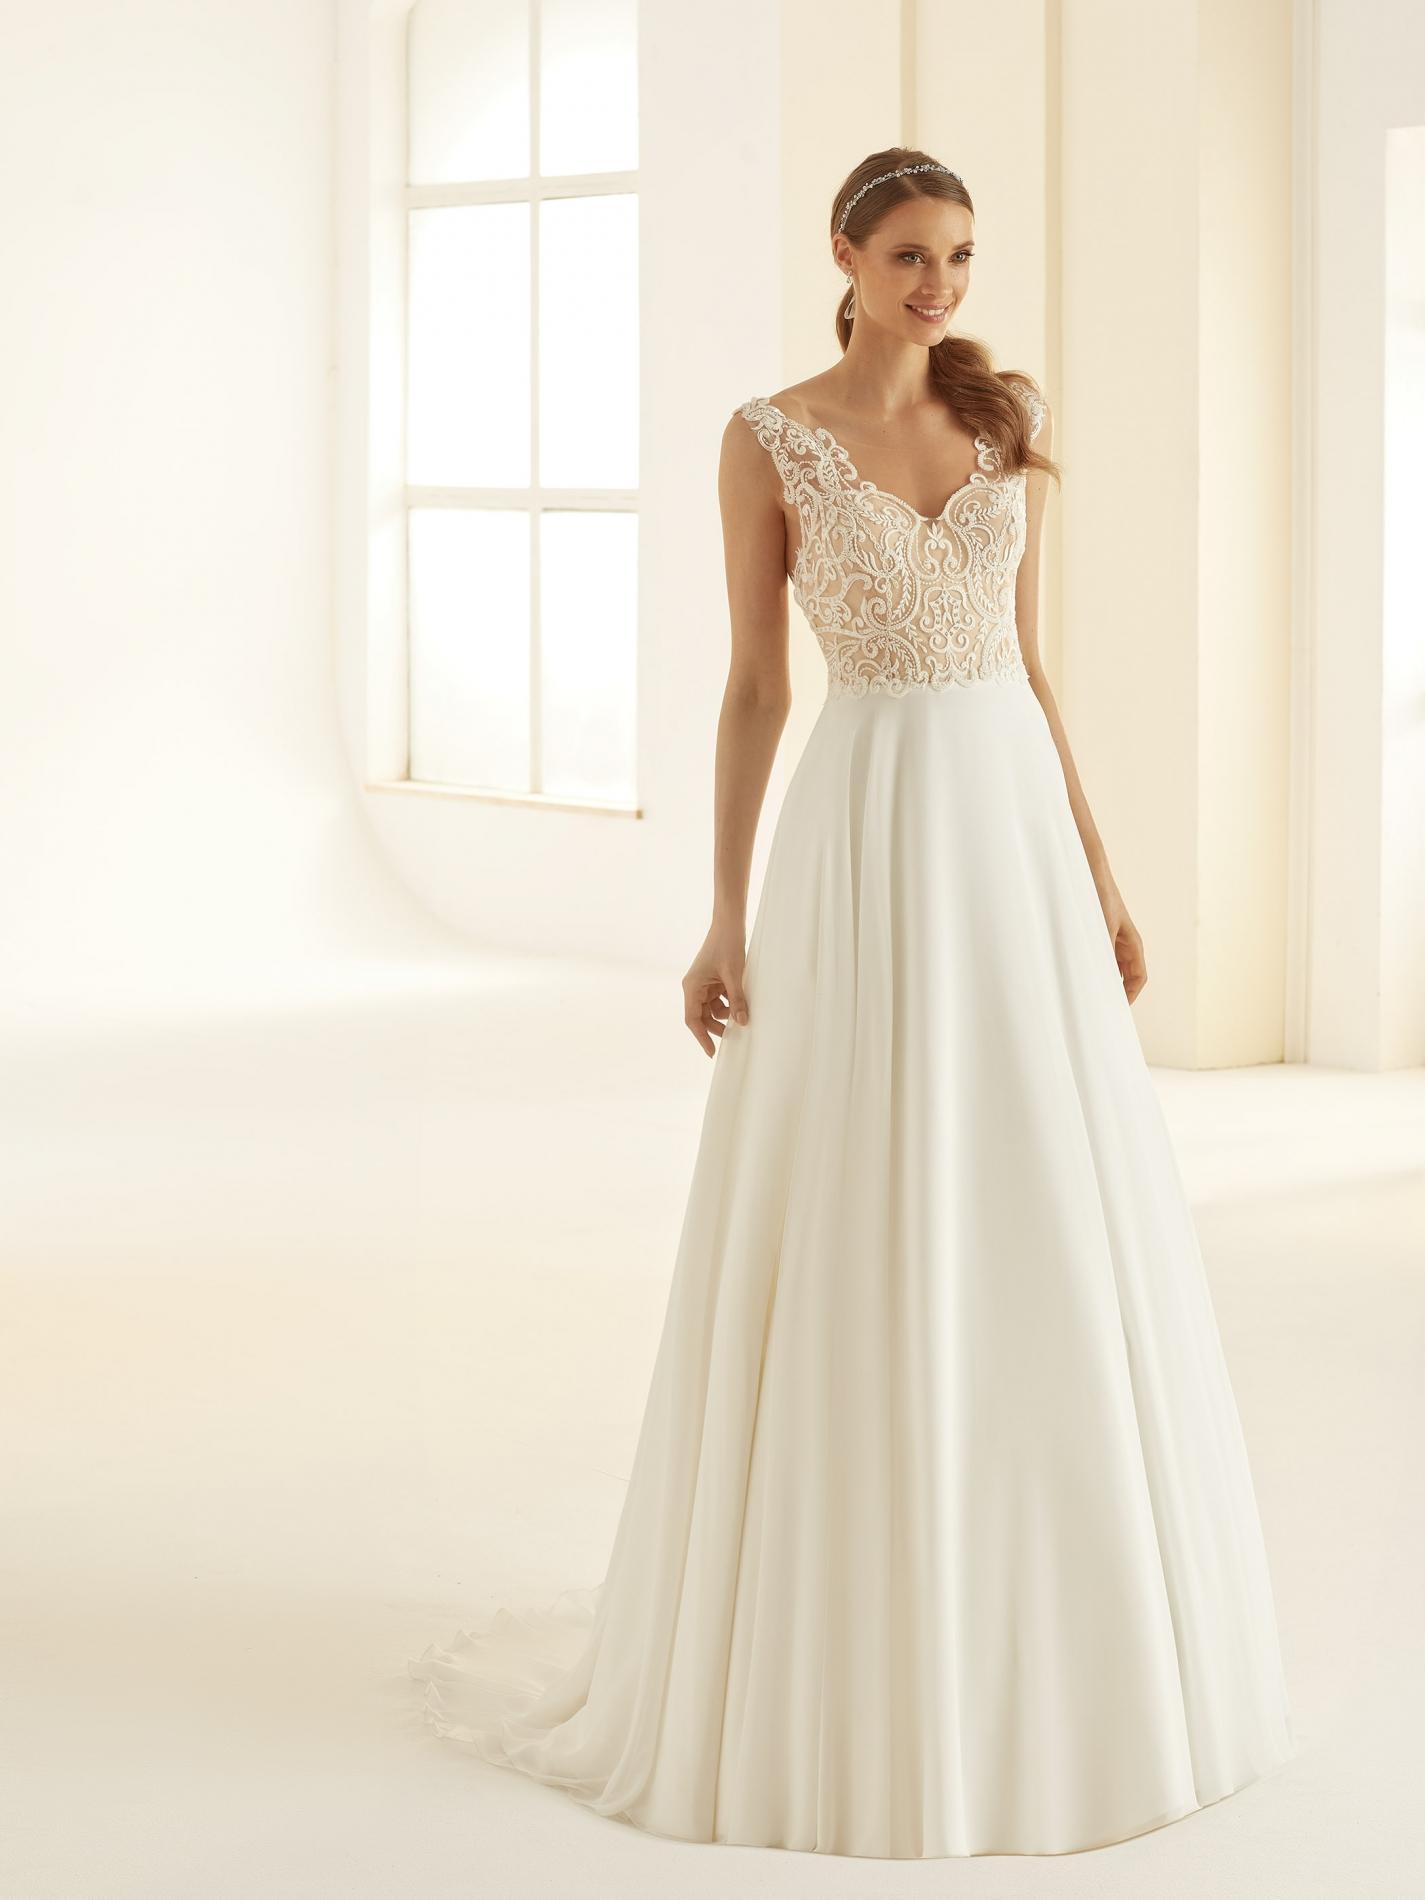 PANDORA_nude-Bianco-Evento-bridal-dress-(1)